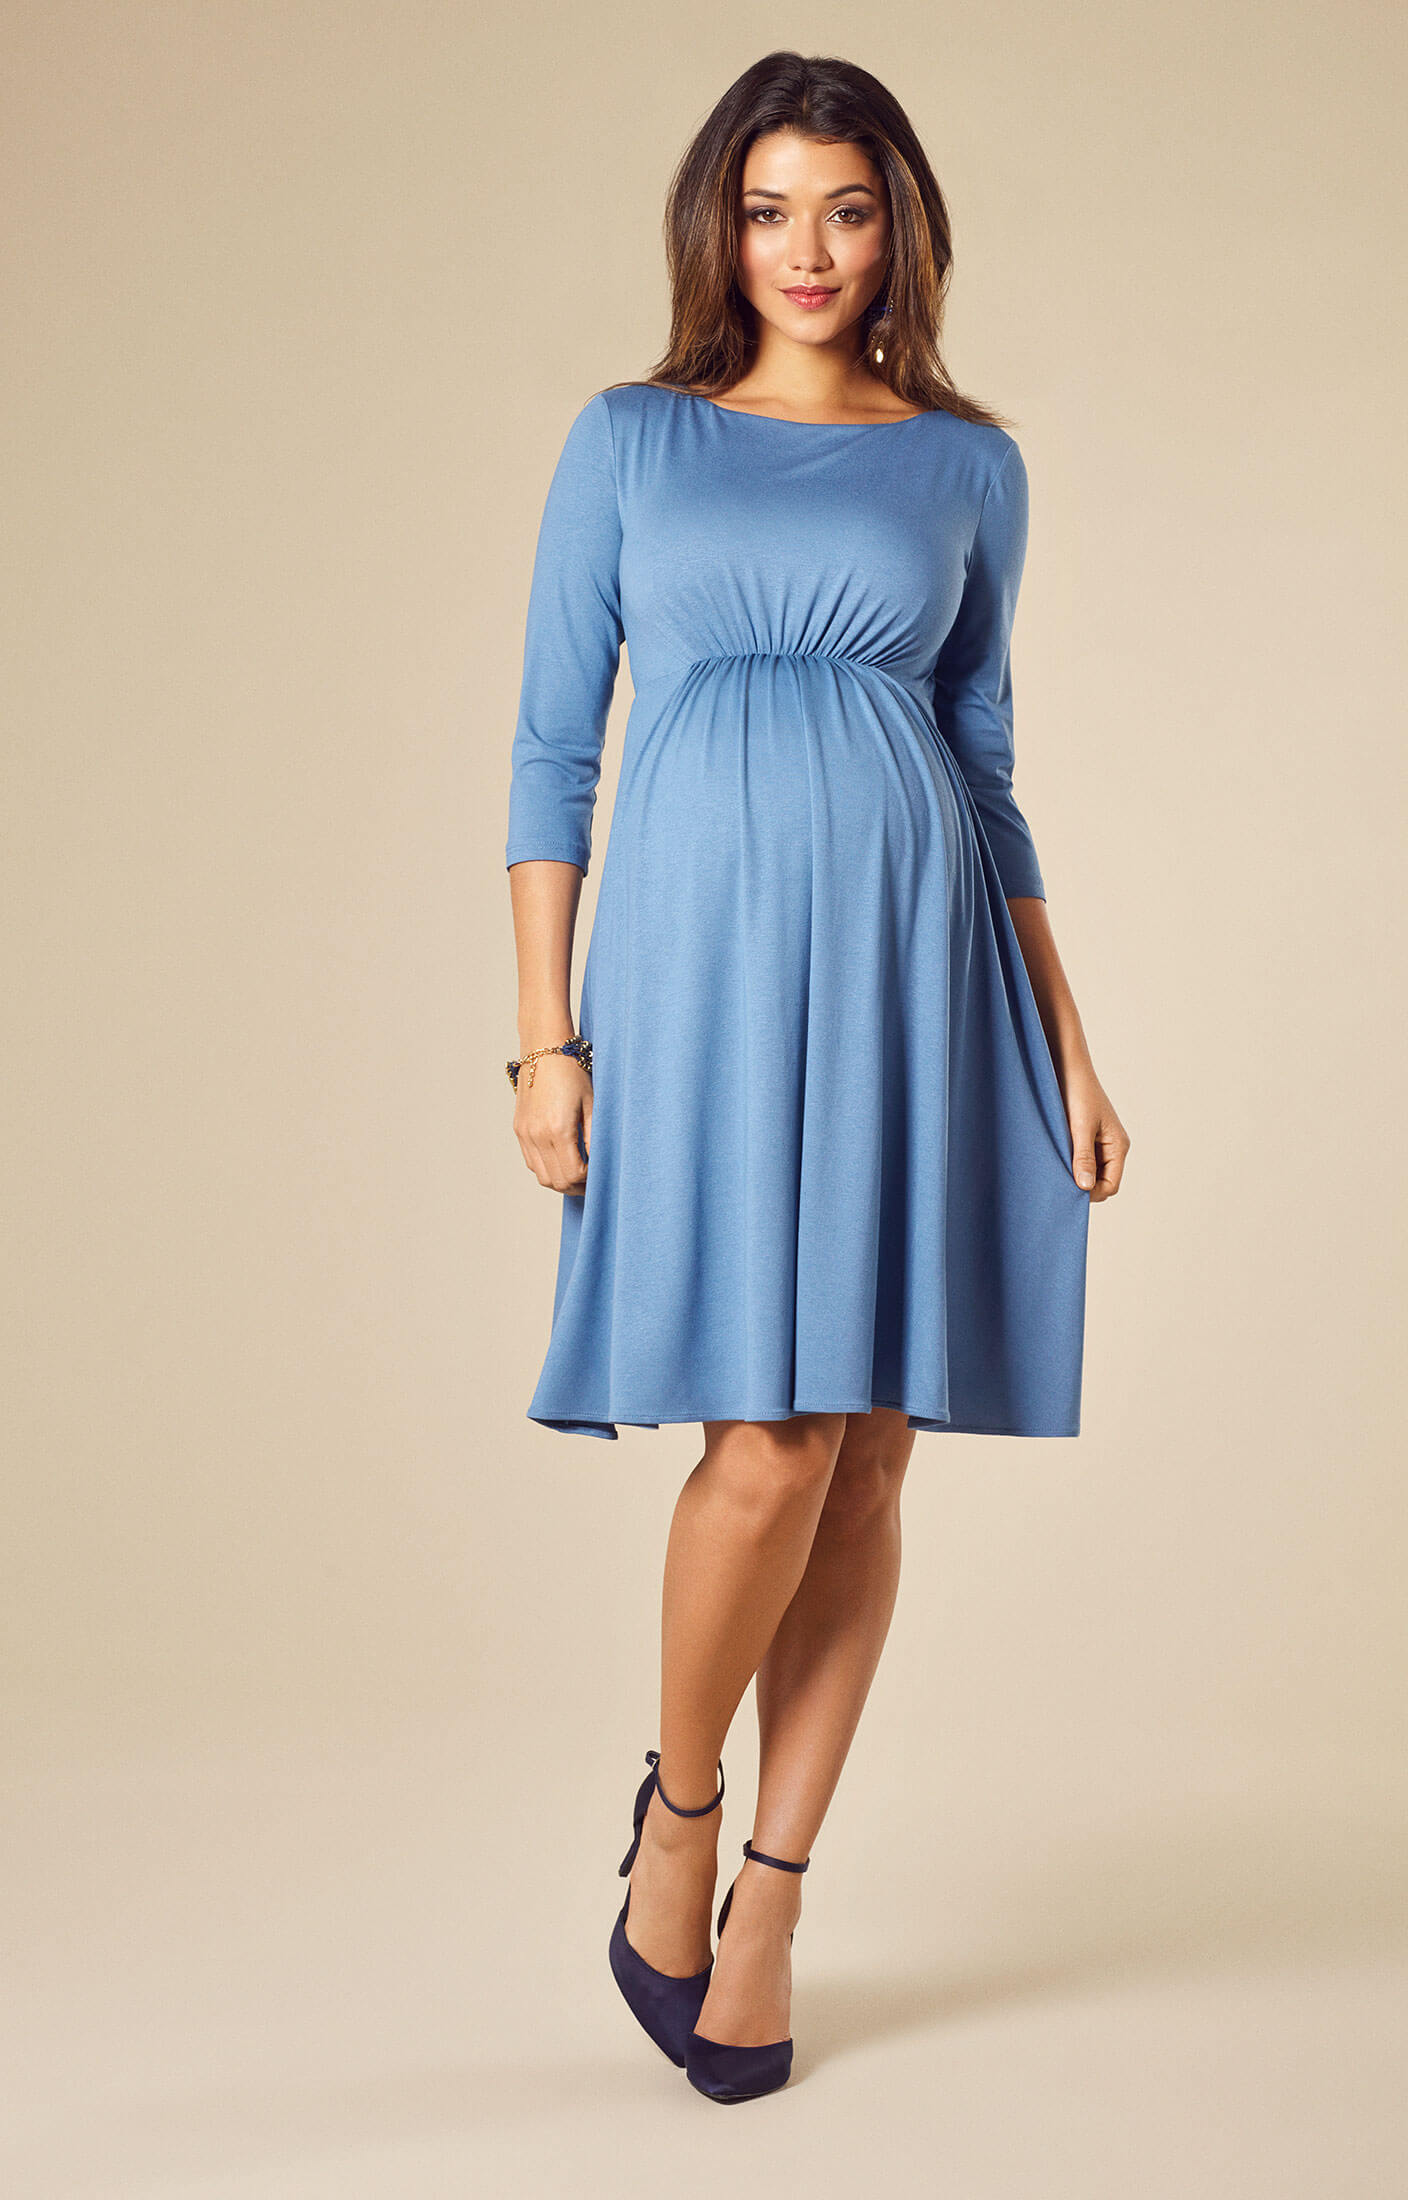 Cathy maternity dress short lagoon blue maternity wedding cathy maternity dress short lagoon blue by tiffany rose ombrellifo Images